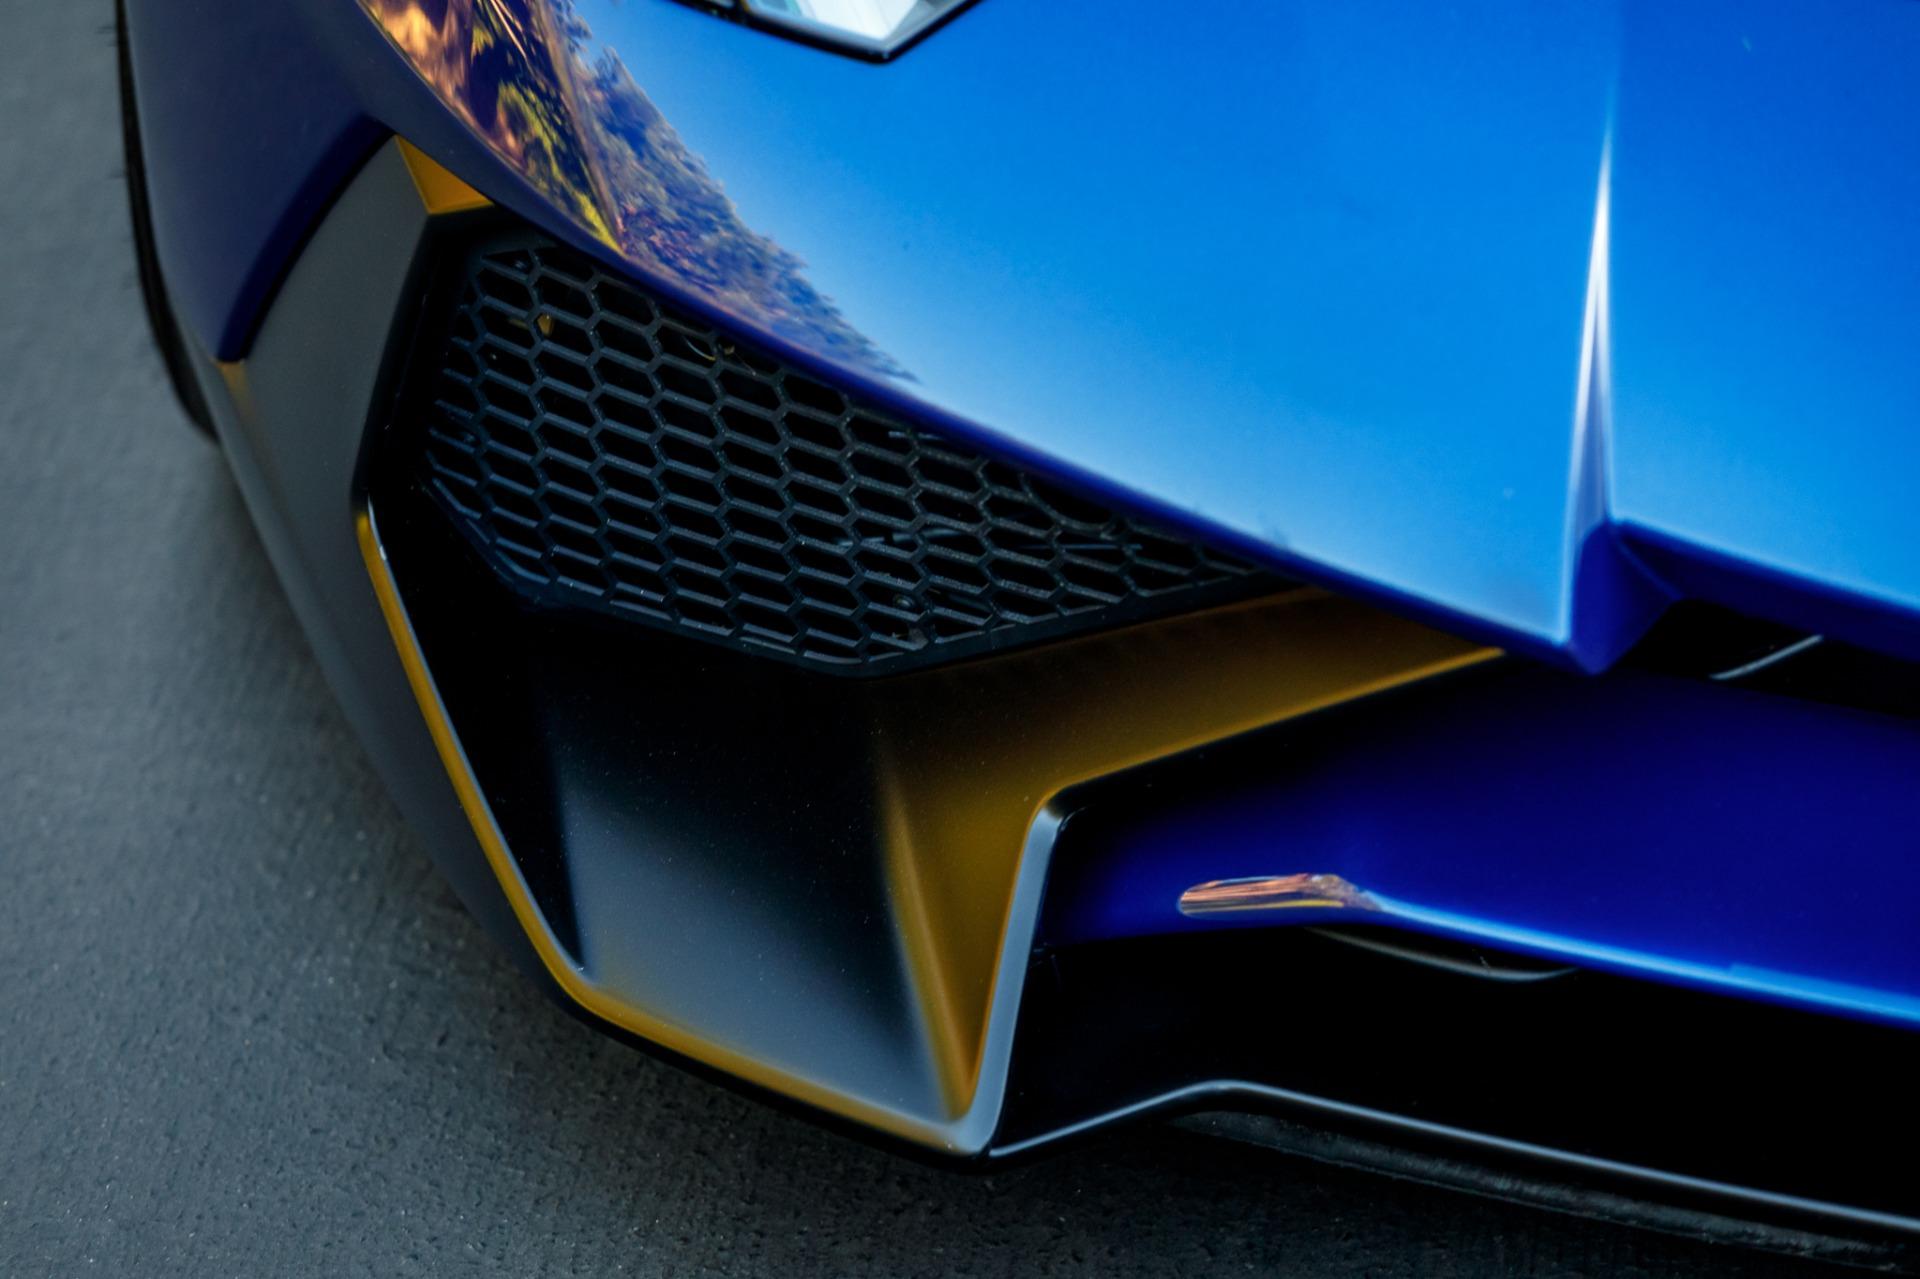 Used 2017 Lamborghini Aventador LP 750-4 SV / 740HP / AWD / 1930 MI / NAV / CAMERA for sale Sold at Formula Imports in Charlotte NC 28227 34